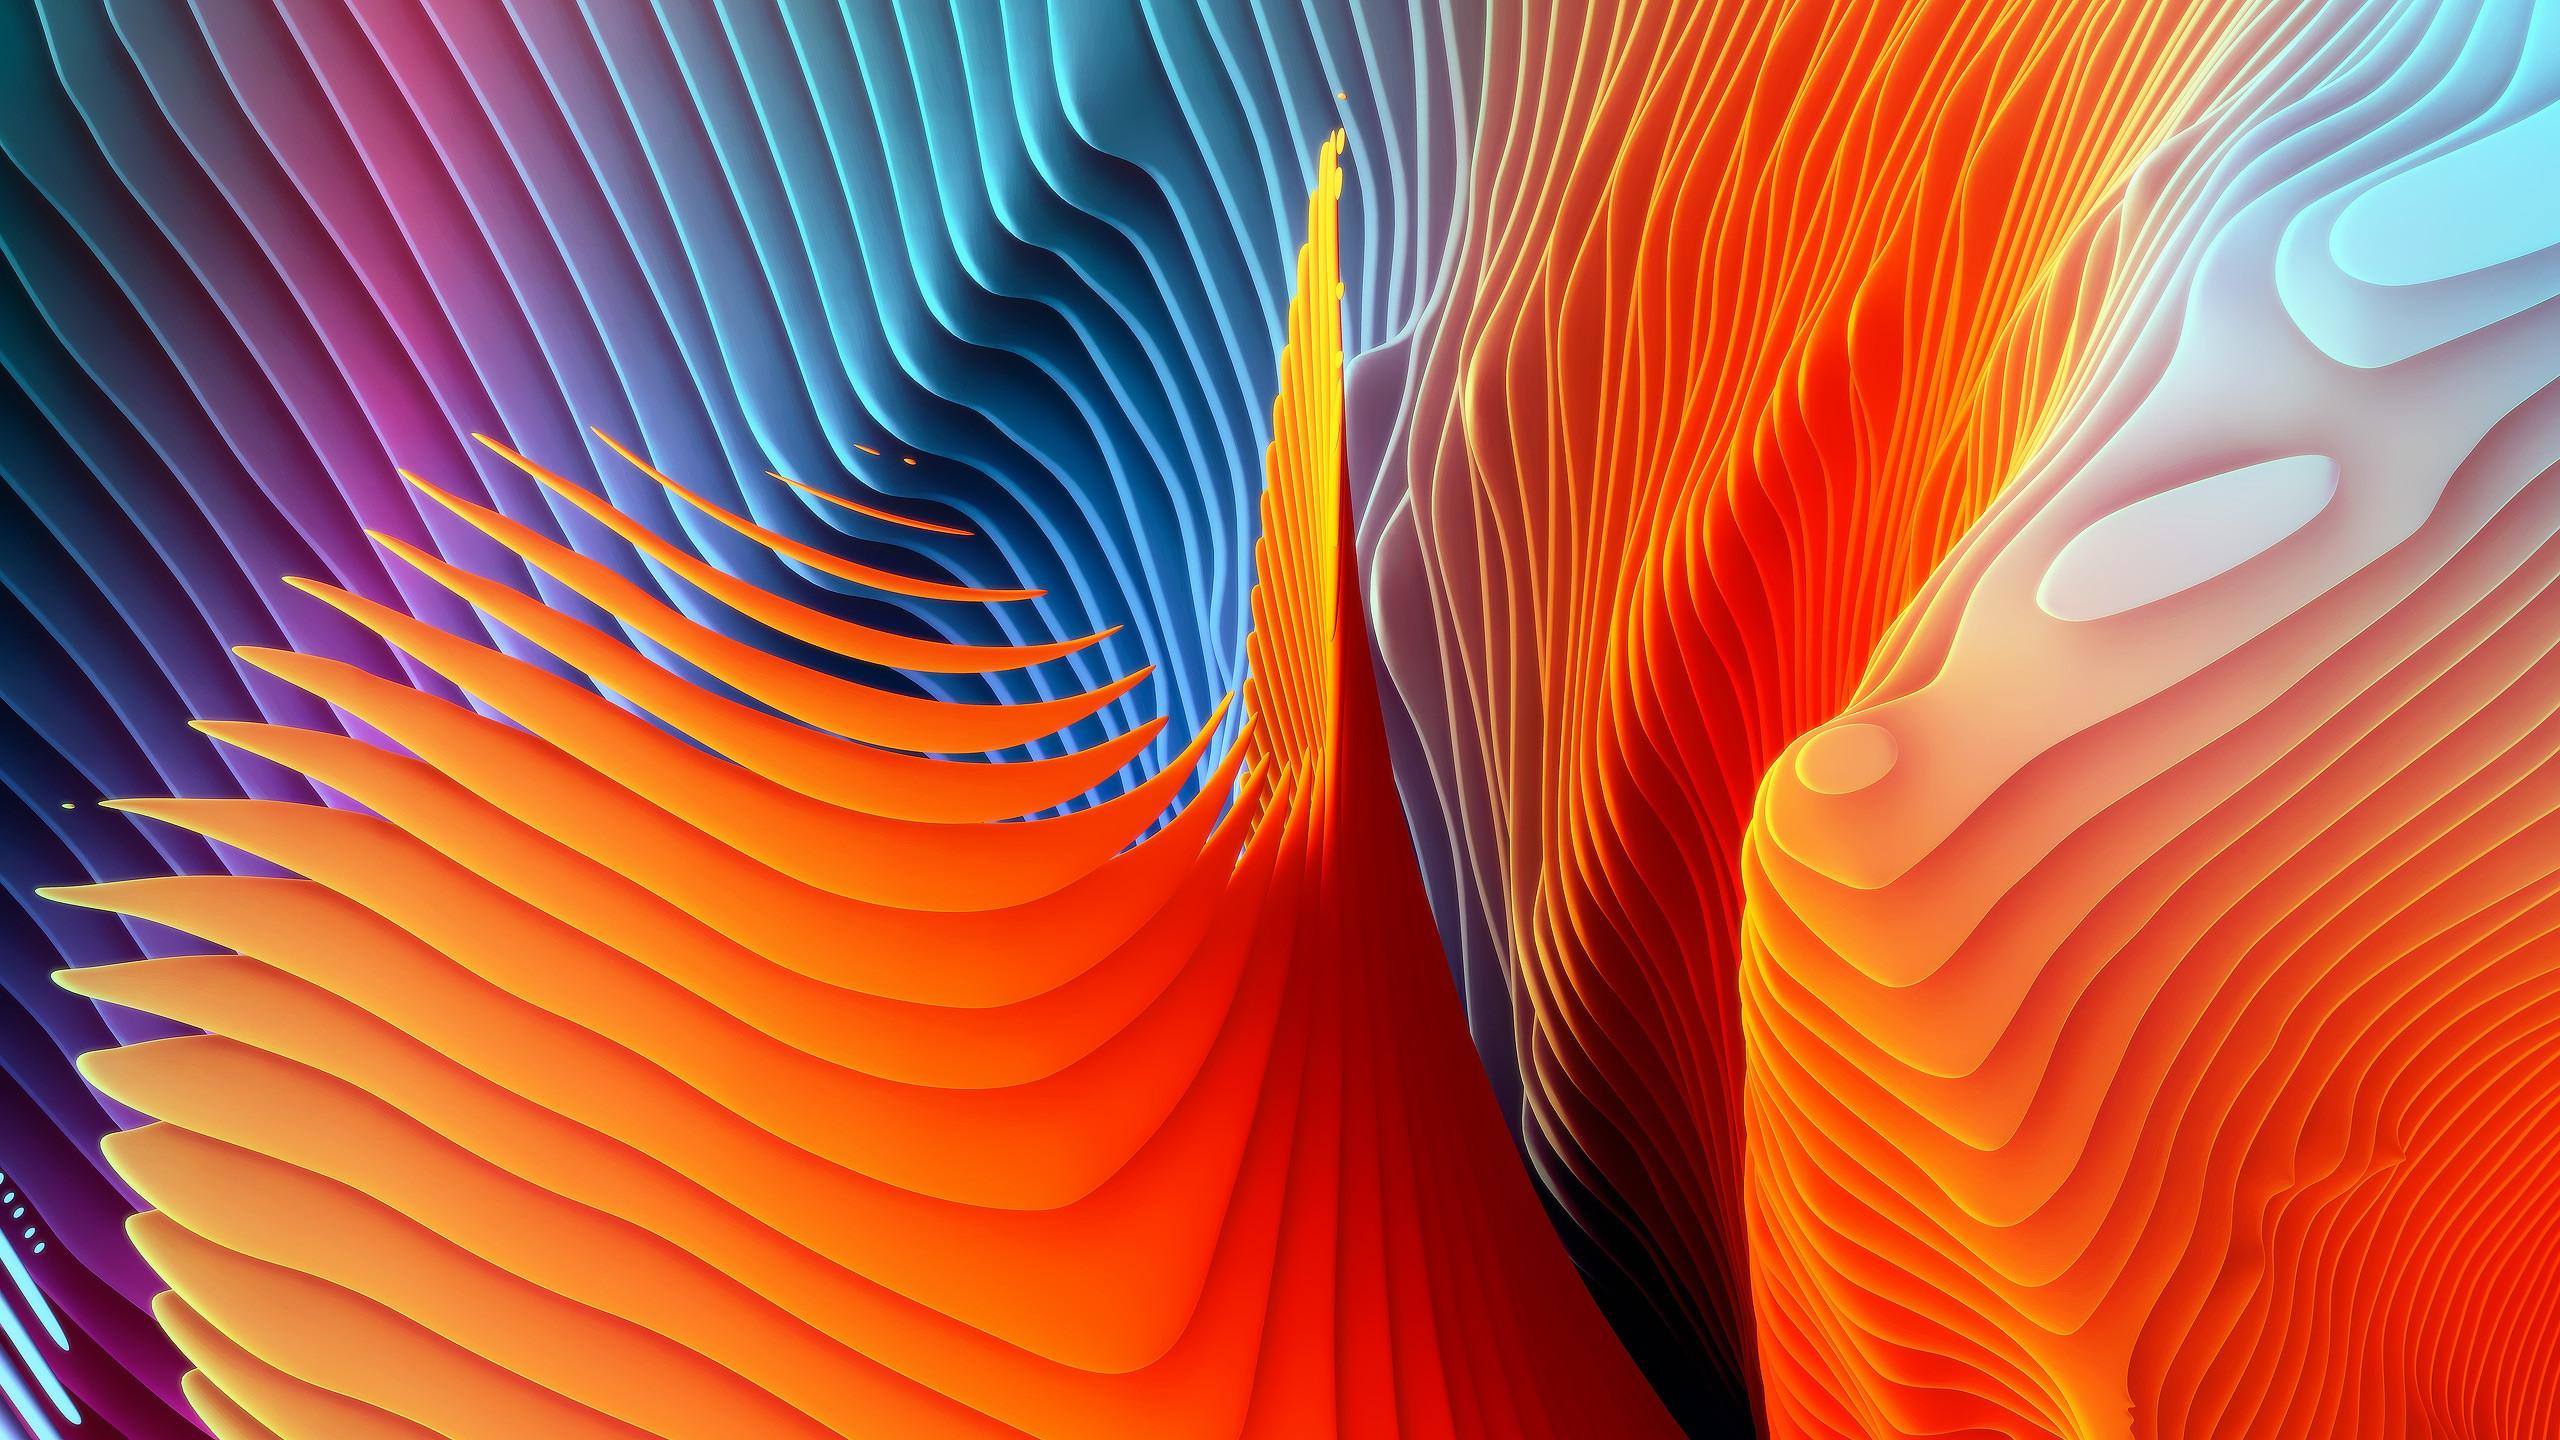 MacBook Pro Event Wallpaper ari weinkle Spiral_4A. Download via  @airweinkle: desktop (2560 …